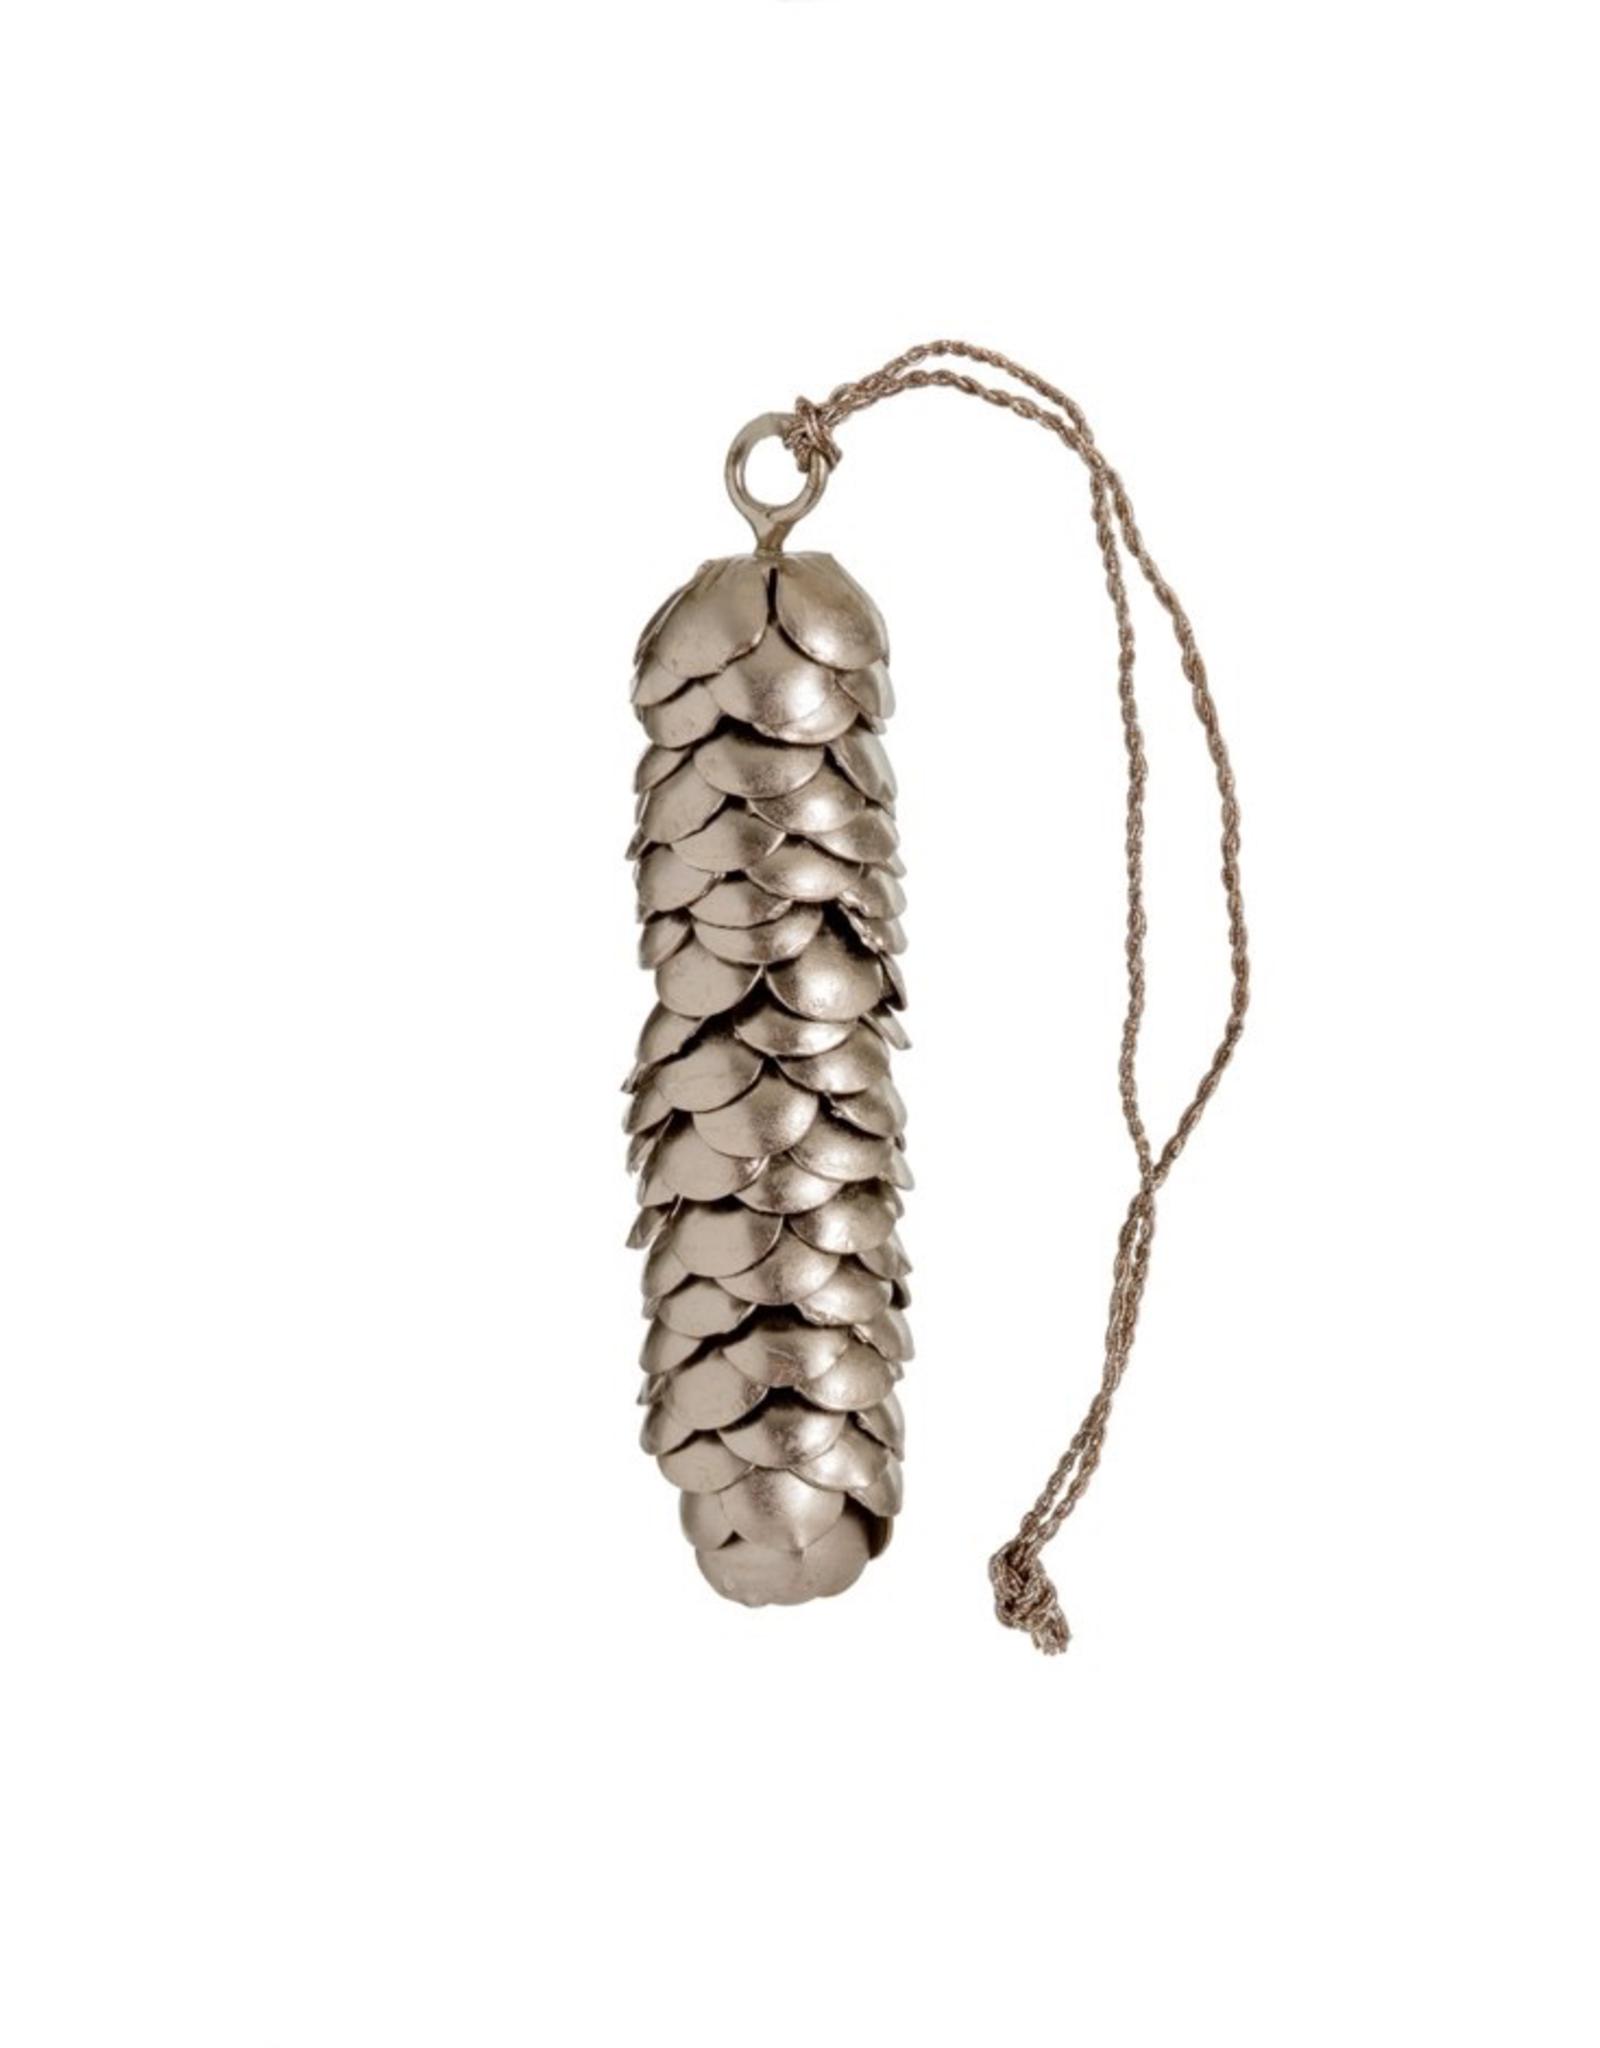 New Metal Pinecone Ornament